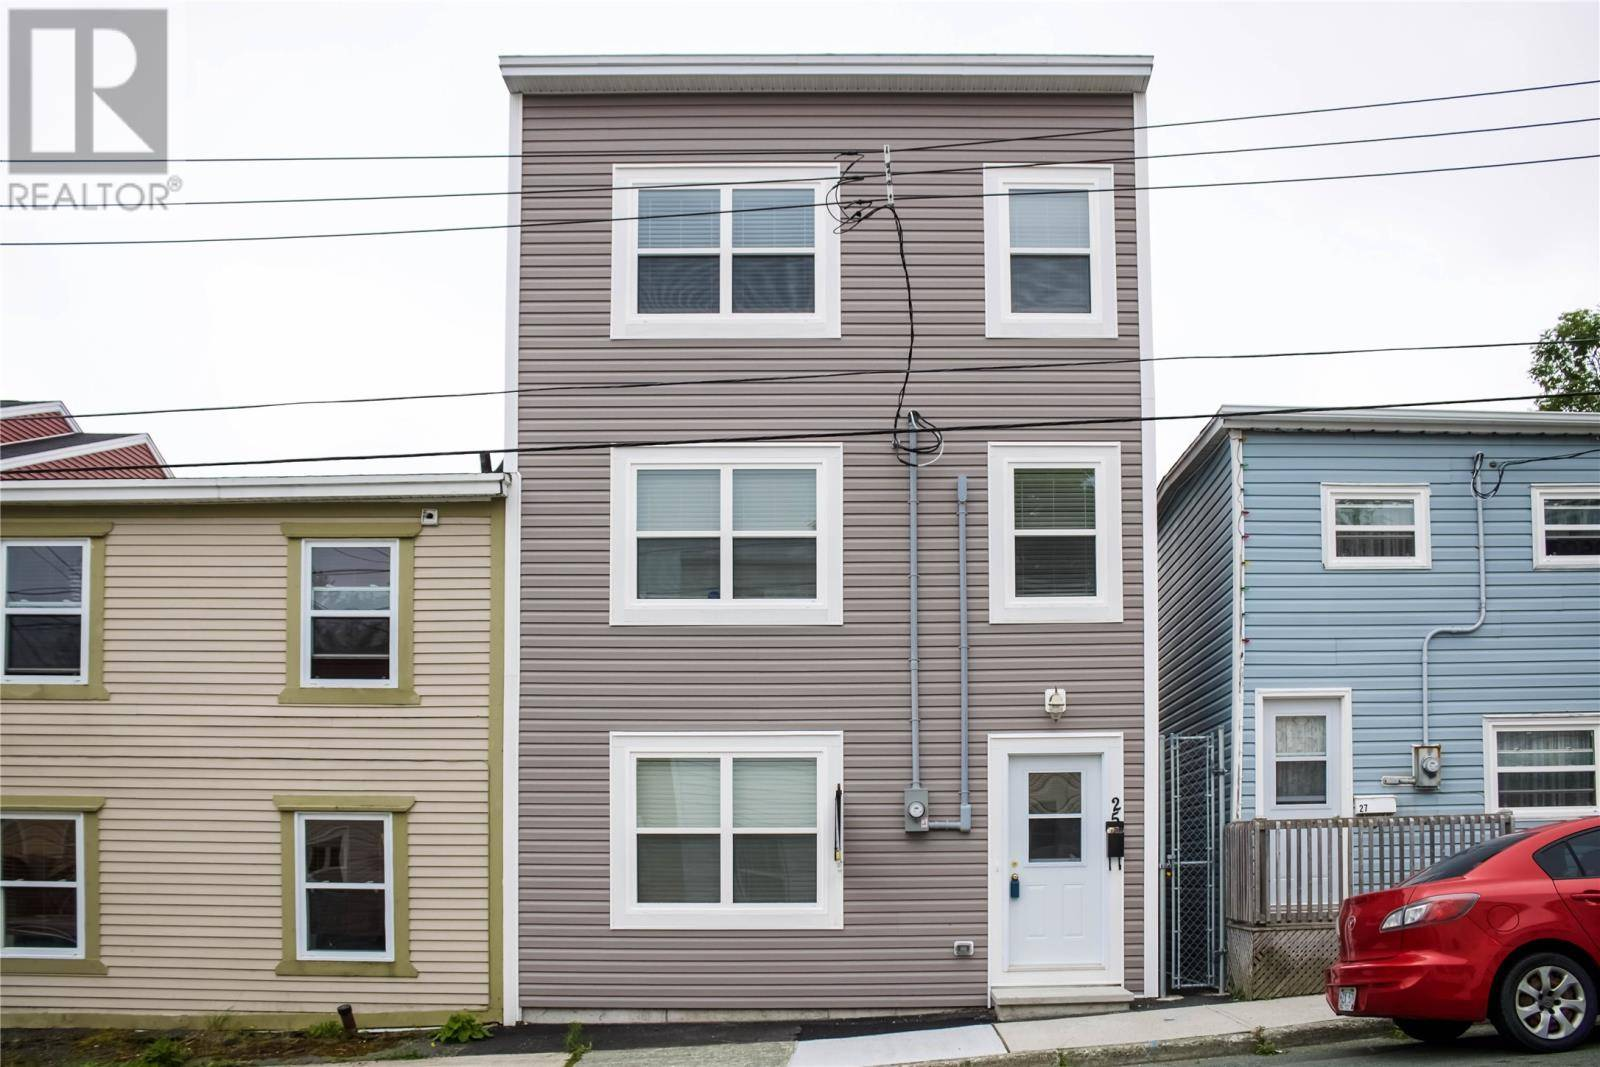 House for sale at 25 Boncloddy St St. John's Newfoundland - MLS: 1206884